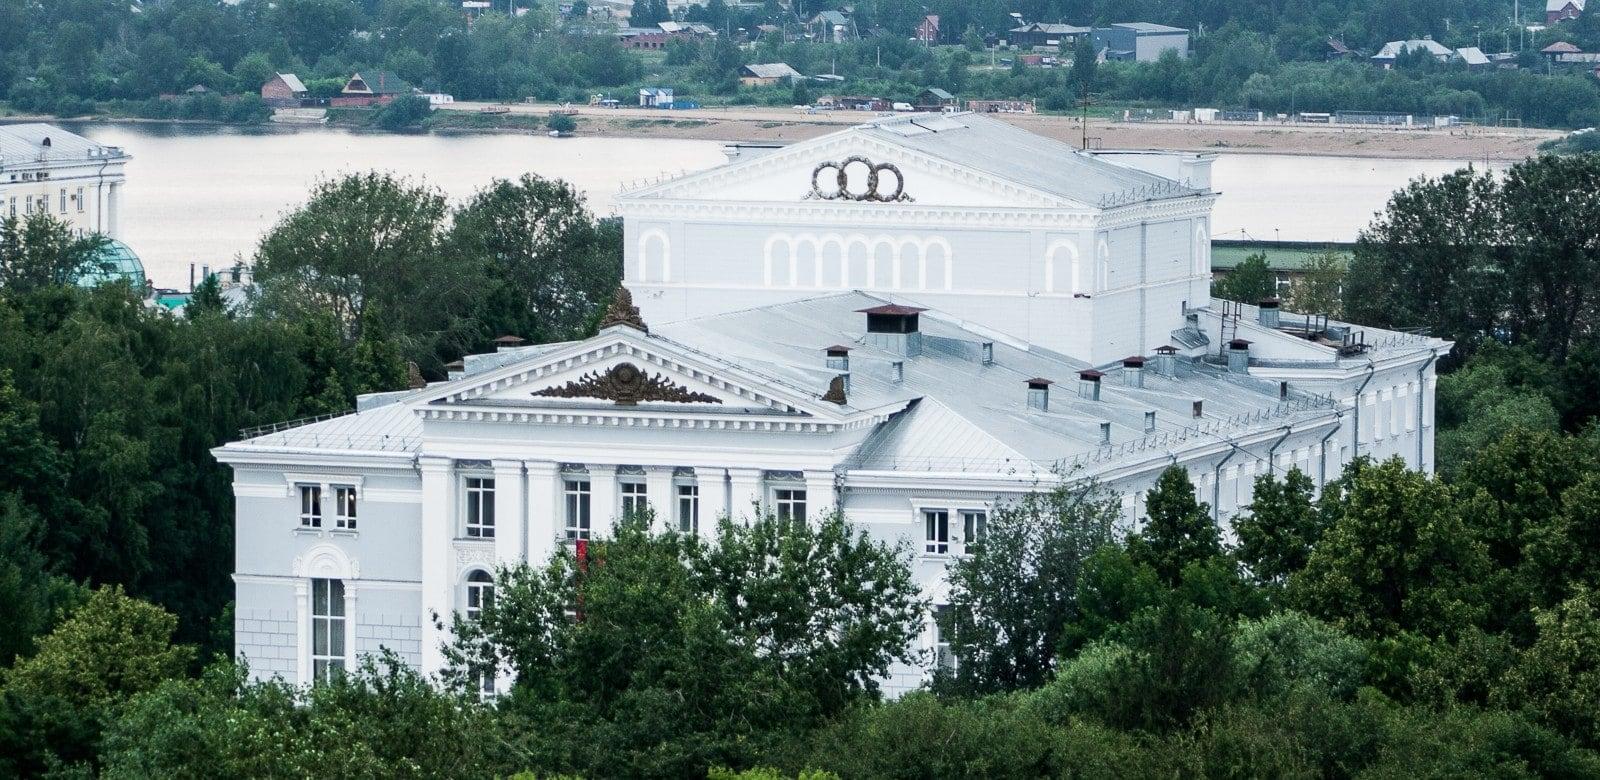 Пермский театр оперы и балета. Фото - Тимур Абасов